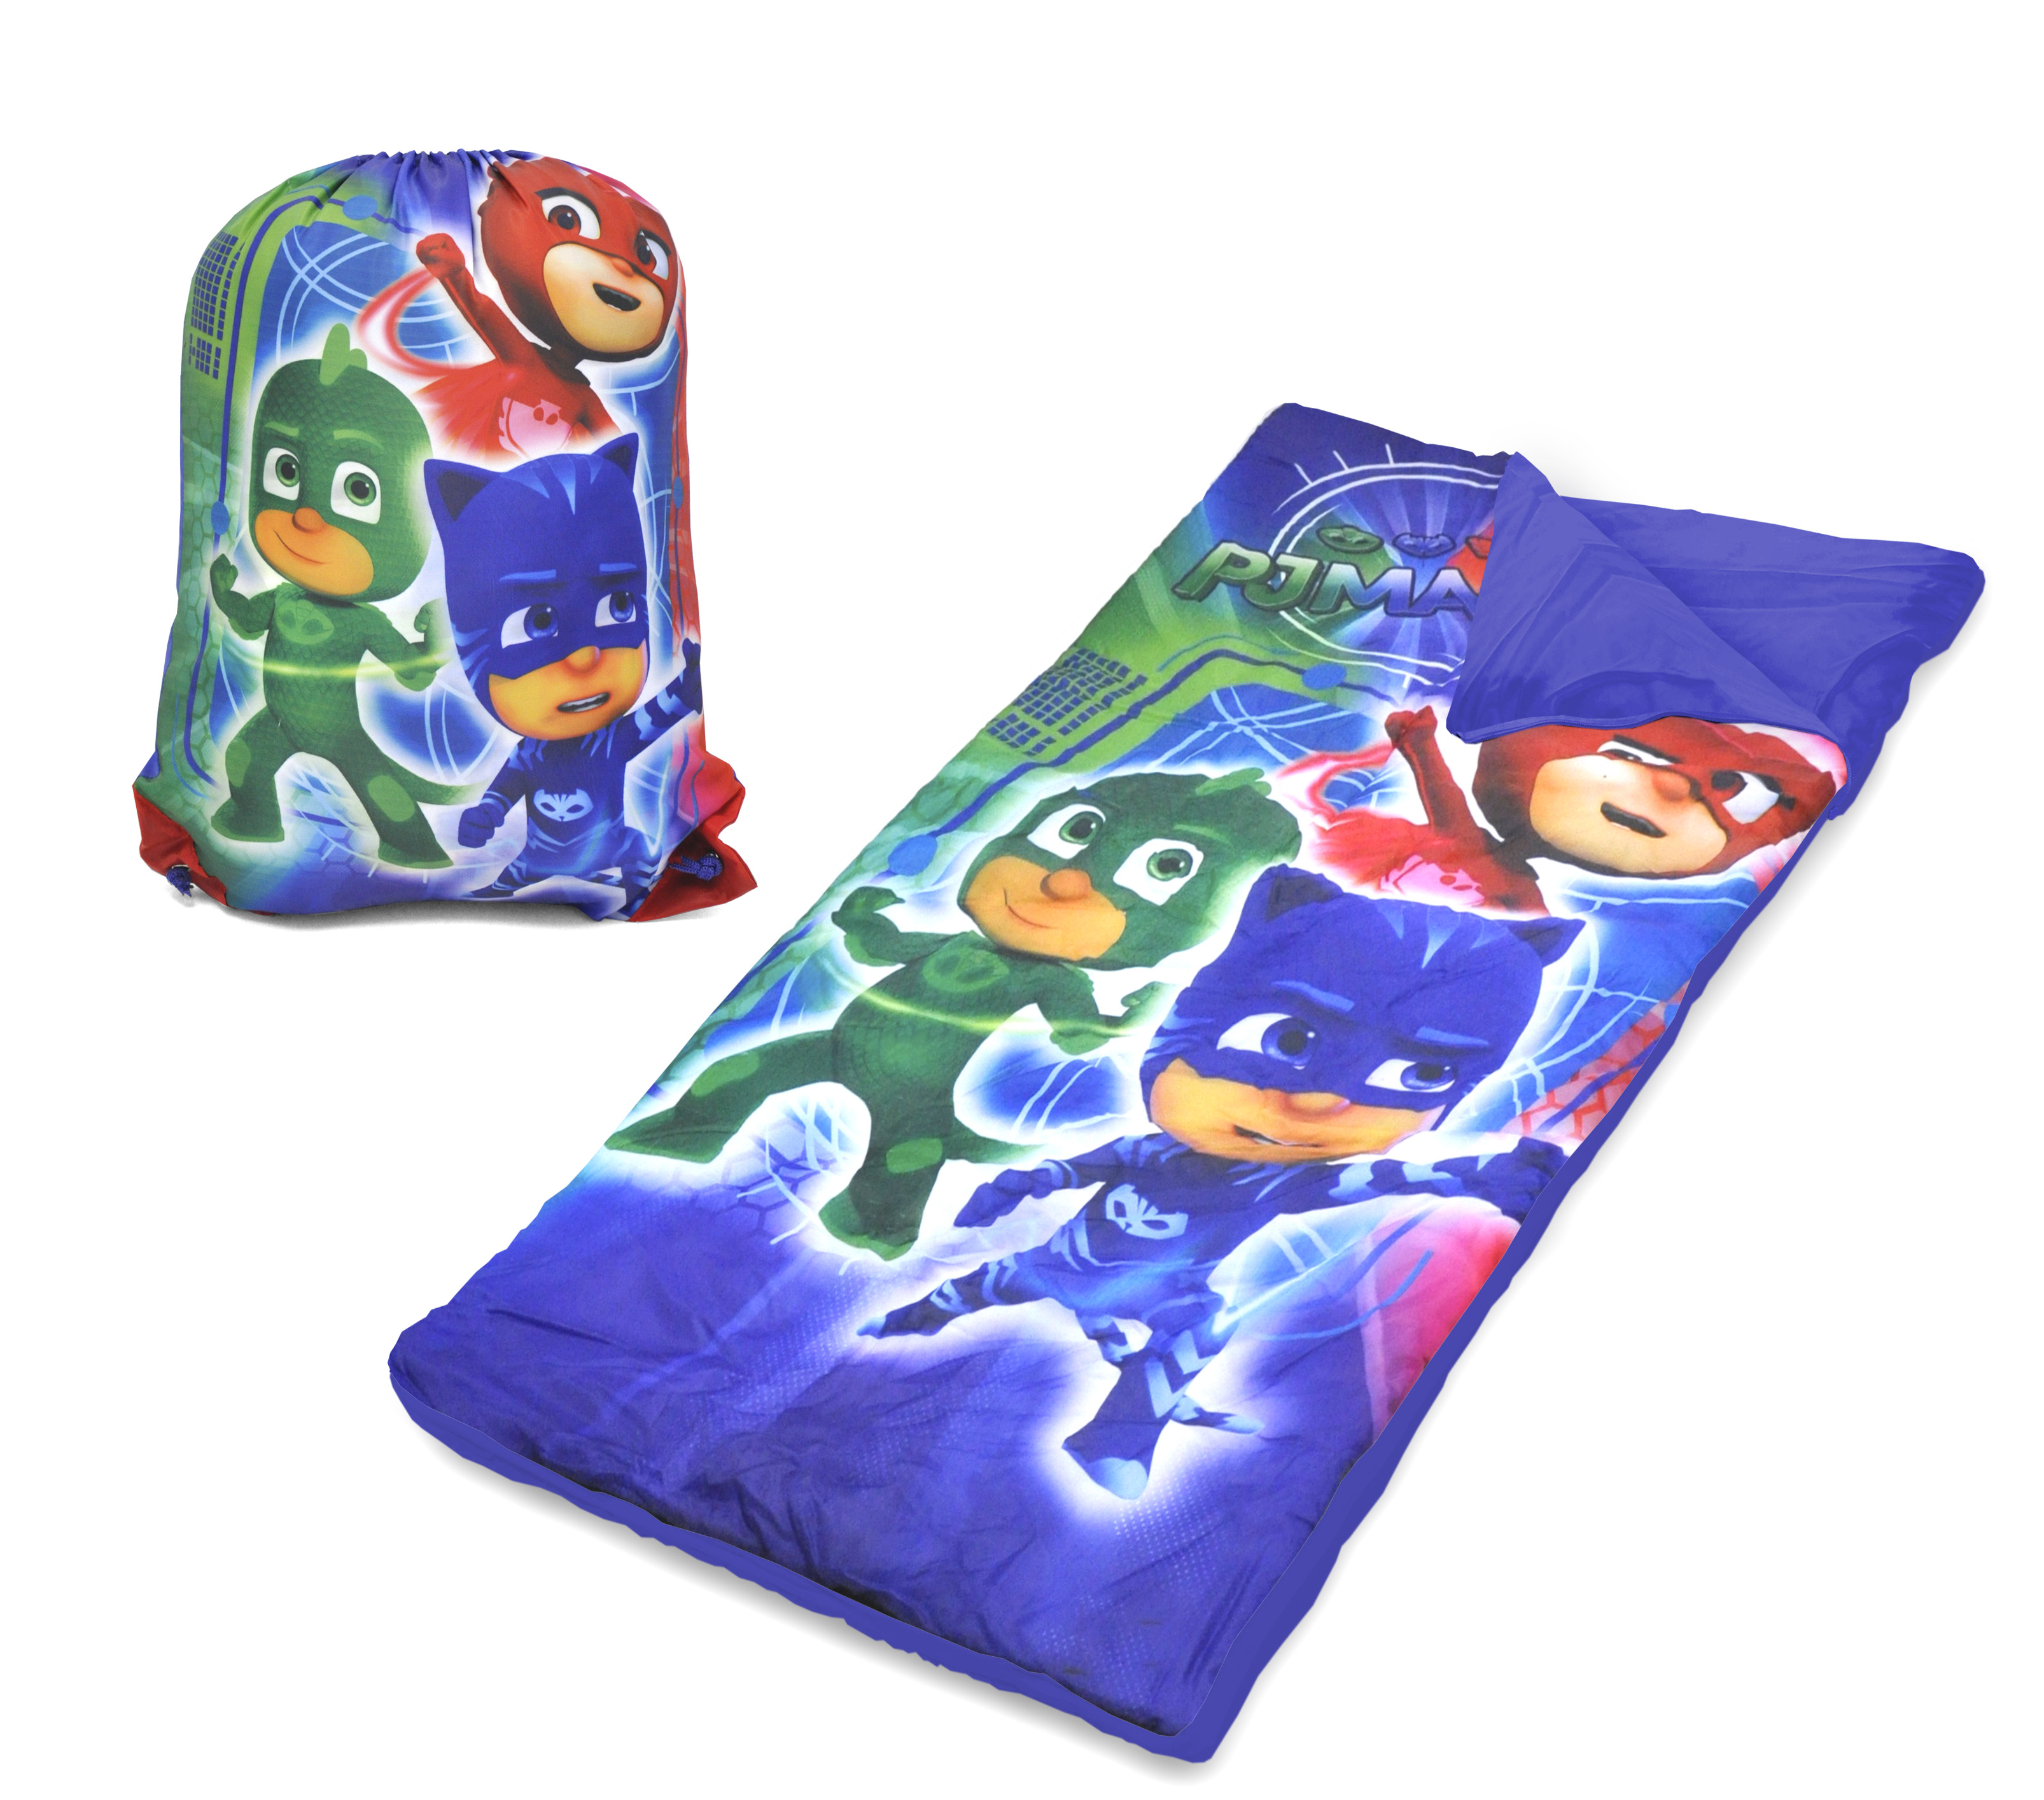 SLEEPING BAG SET PJ MASKS SLING BAG For Kids Boys Girls ...